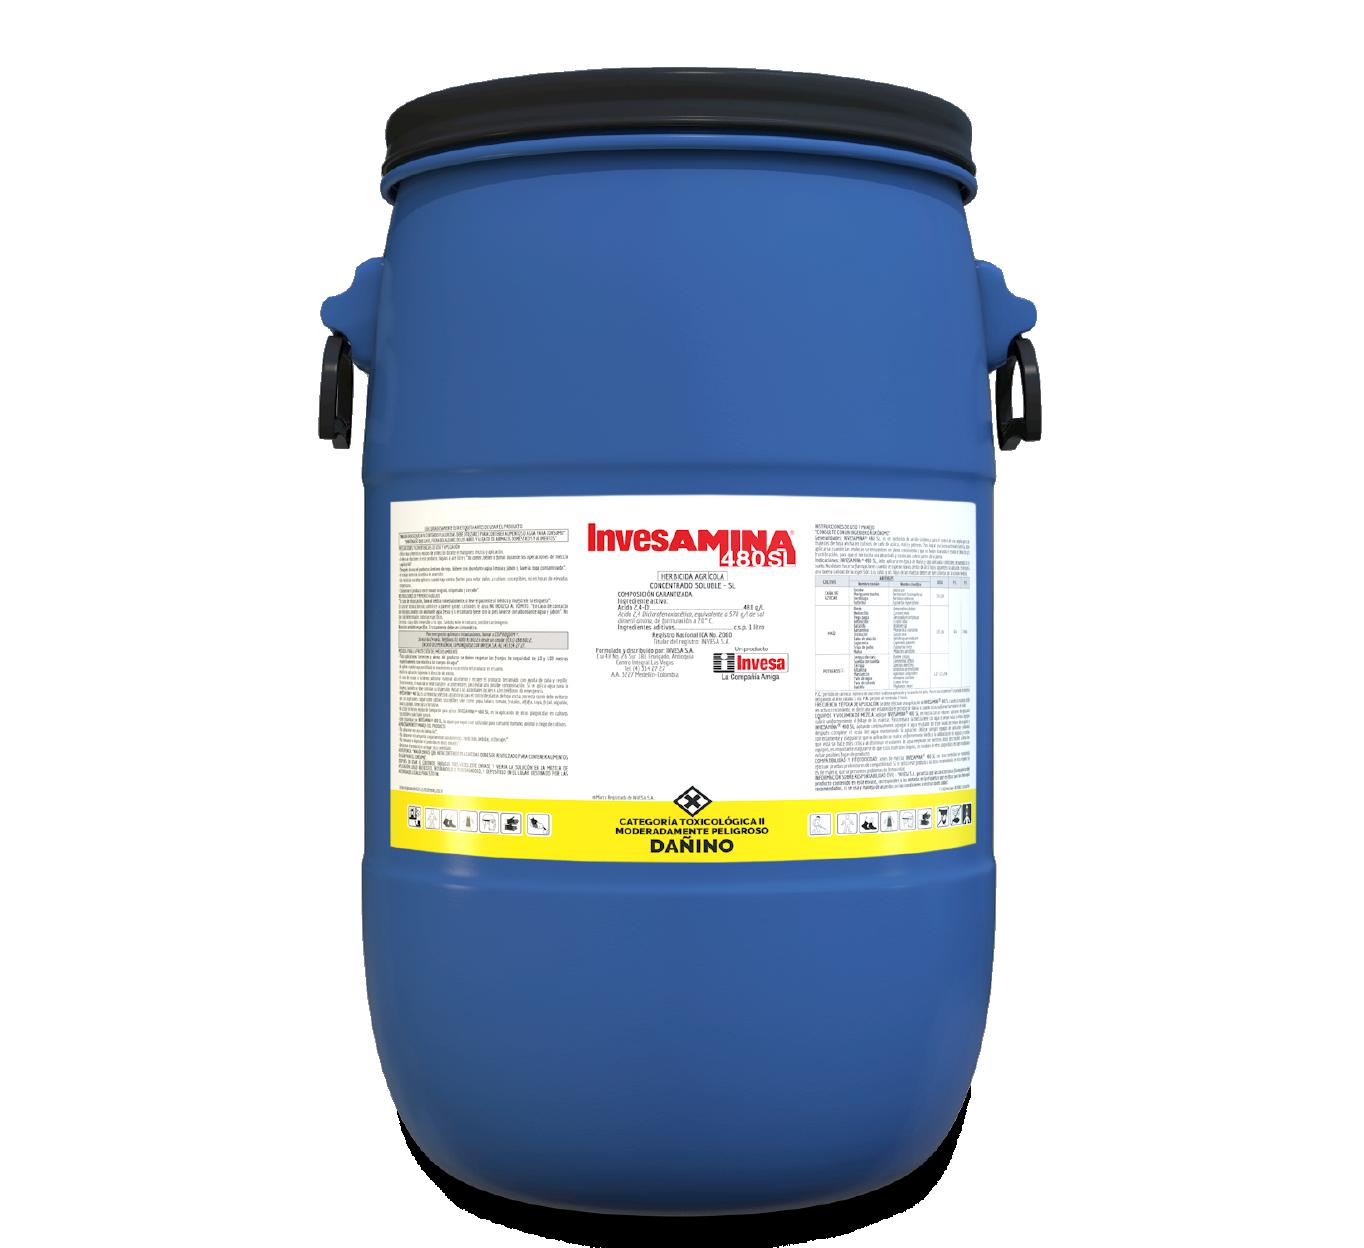 Herbicida invesamina 480 invesa 60 litros